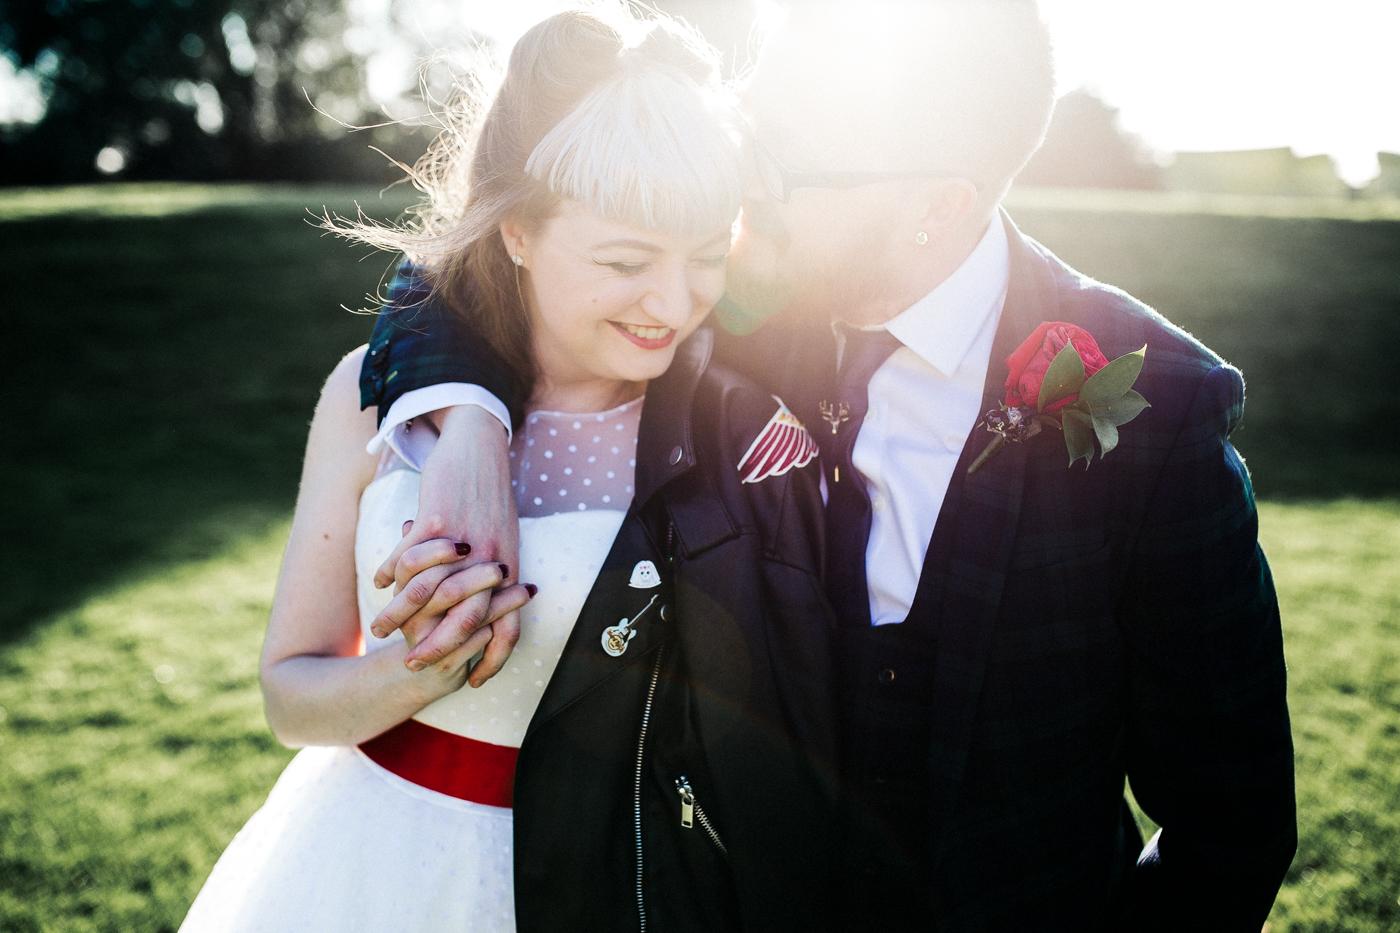 teesside-middlesbrough-north-east-wedding-photographer-creative-wedding-venues-0126.jpg